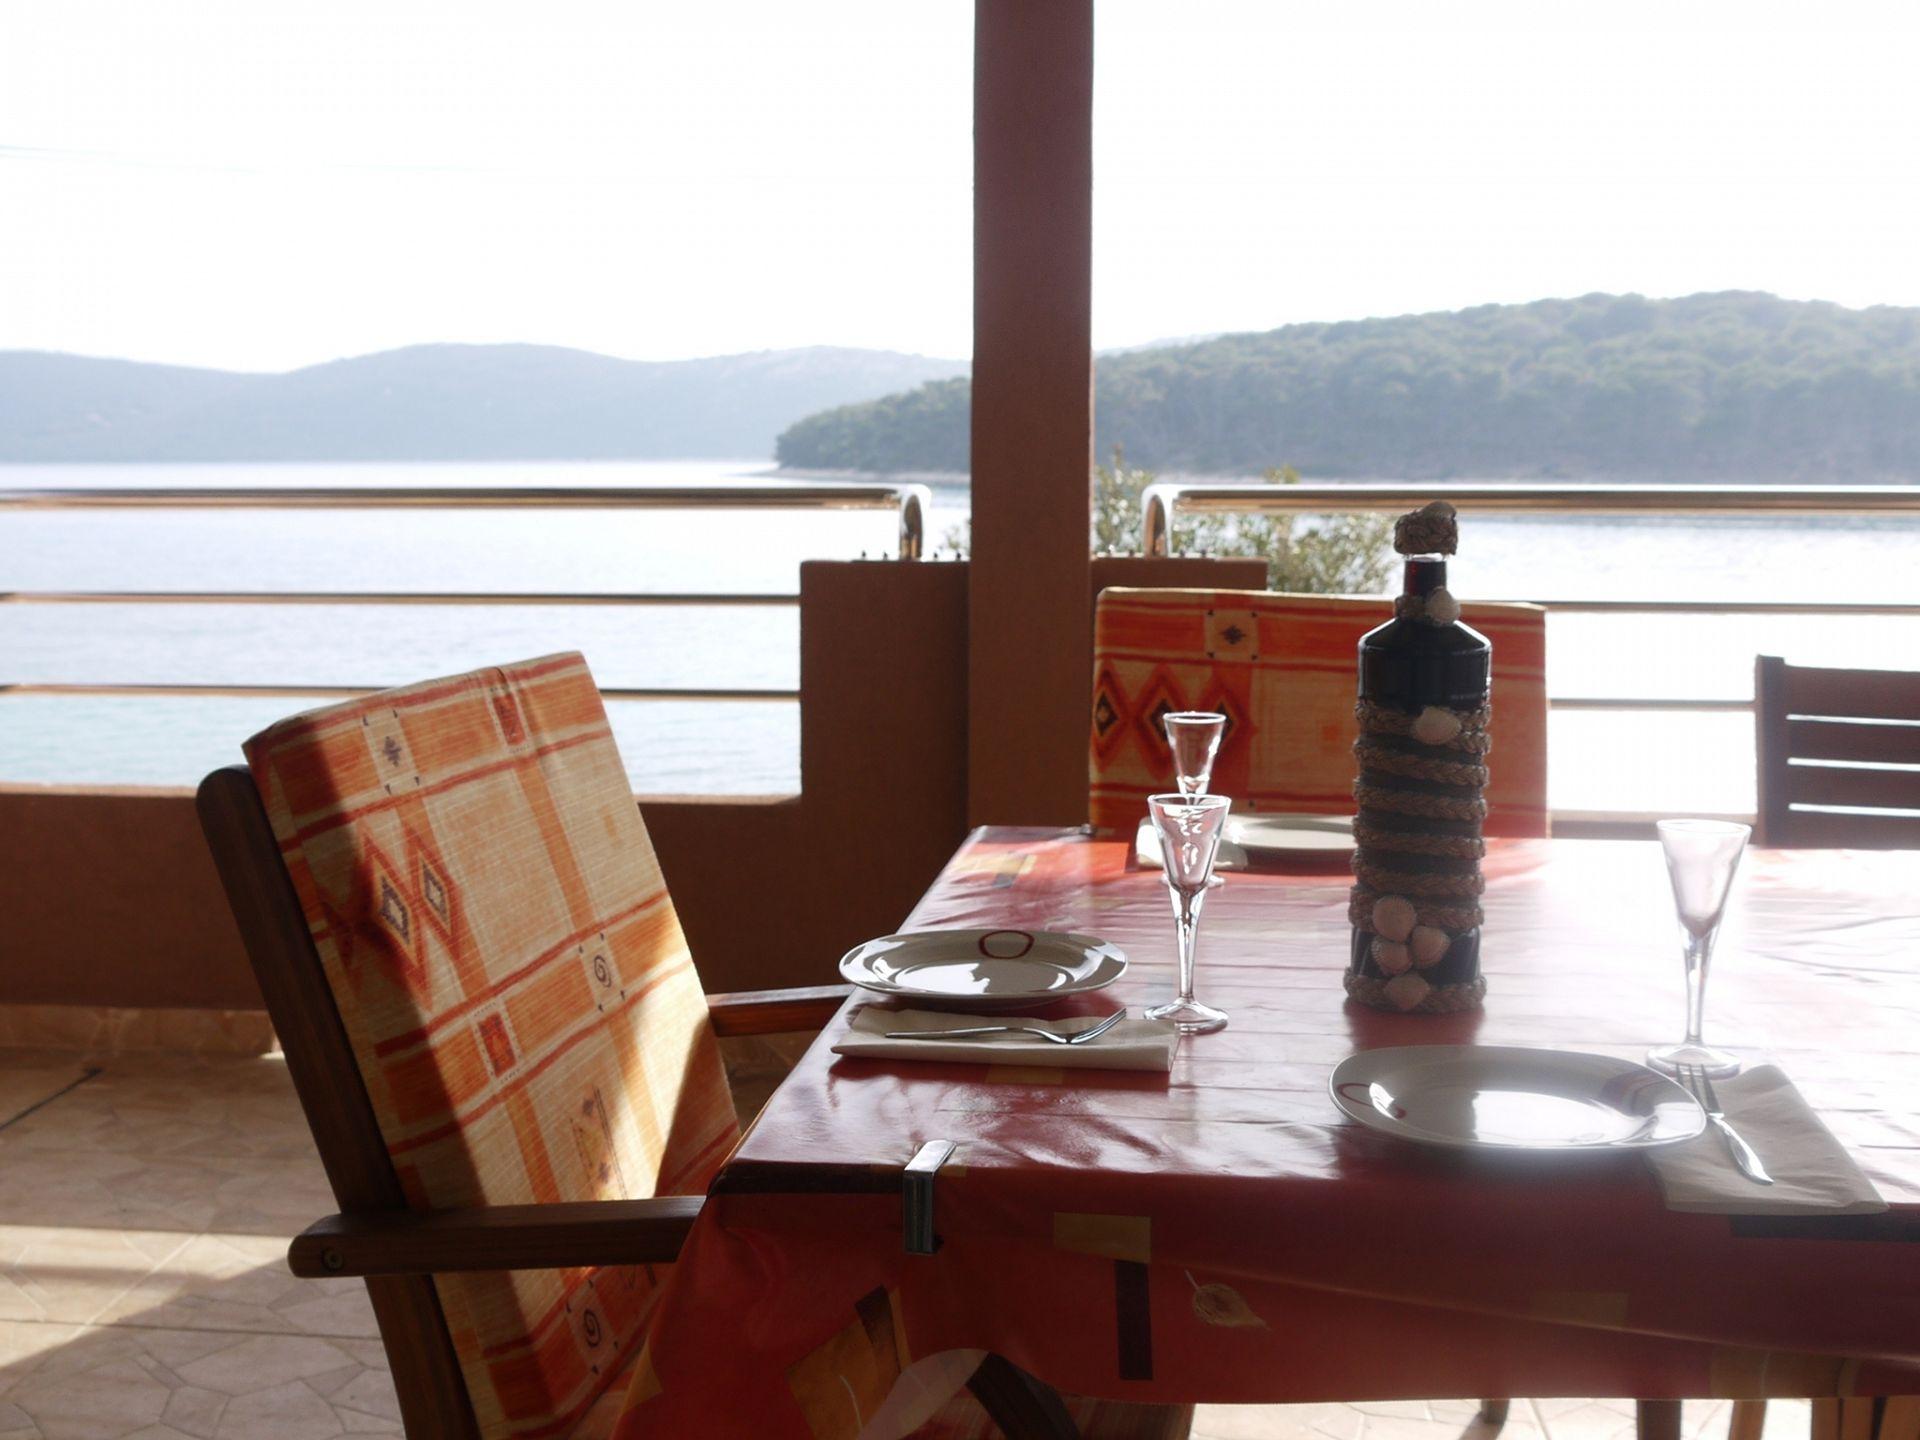 Ado - Molat (Isola di Molat) - Case vacanze, ville Croazia